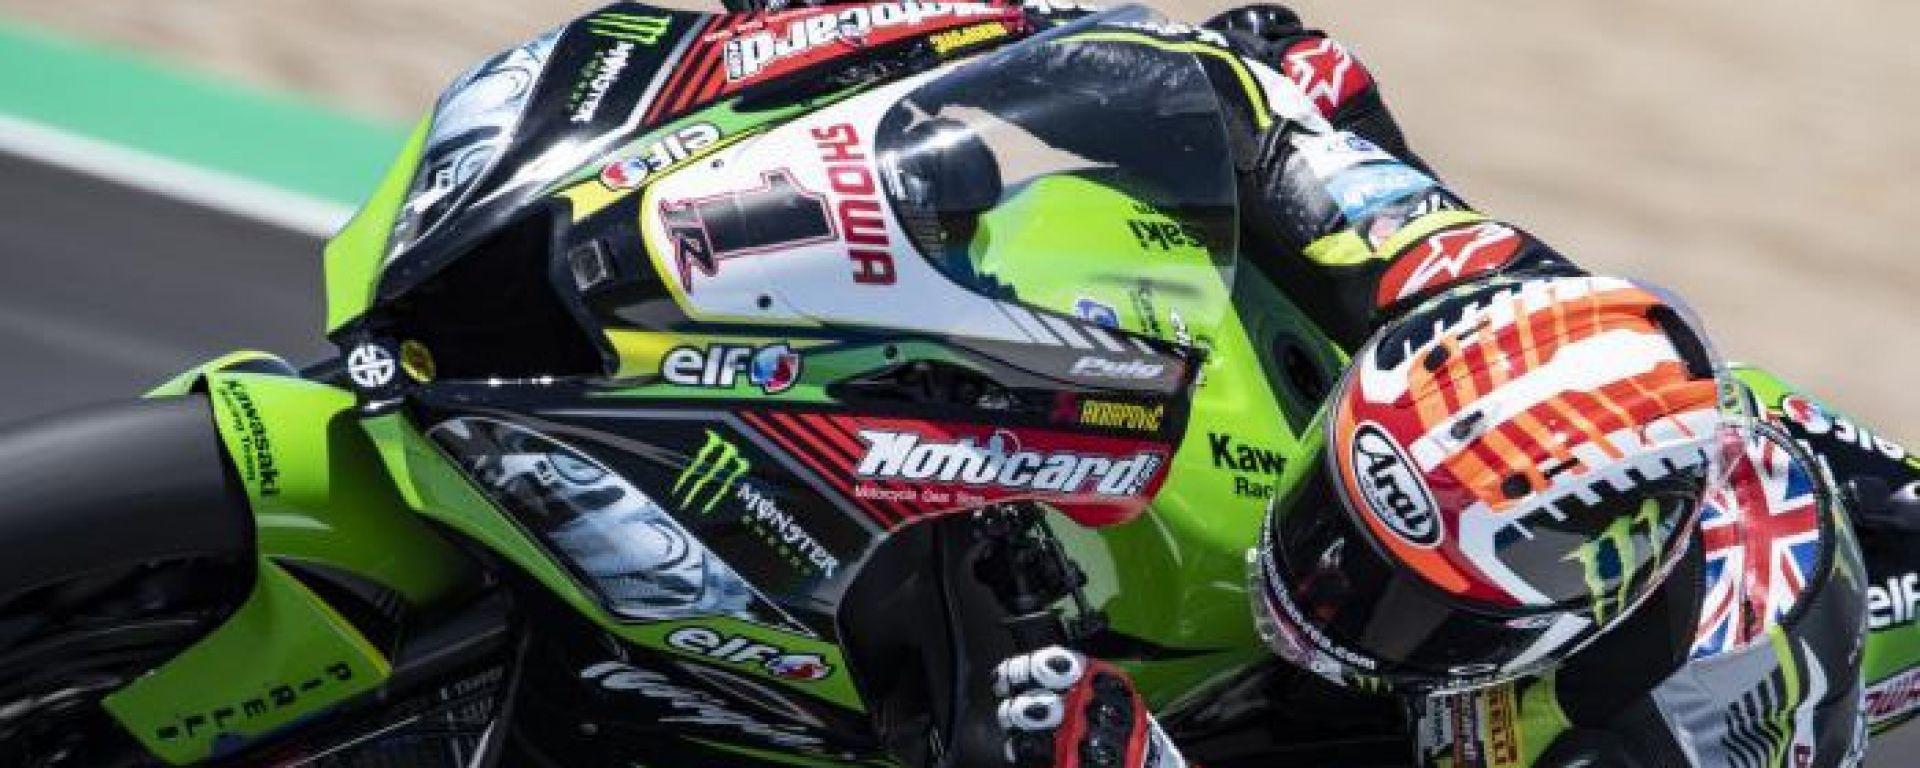 Superbike Jerez: Rea alza la testa, è superpole! 3° Melandri